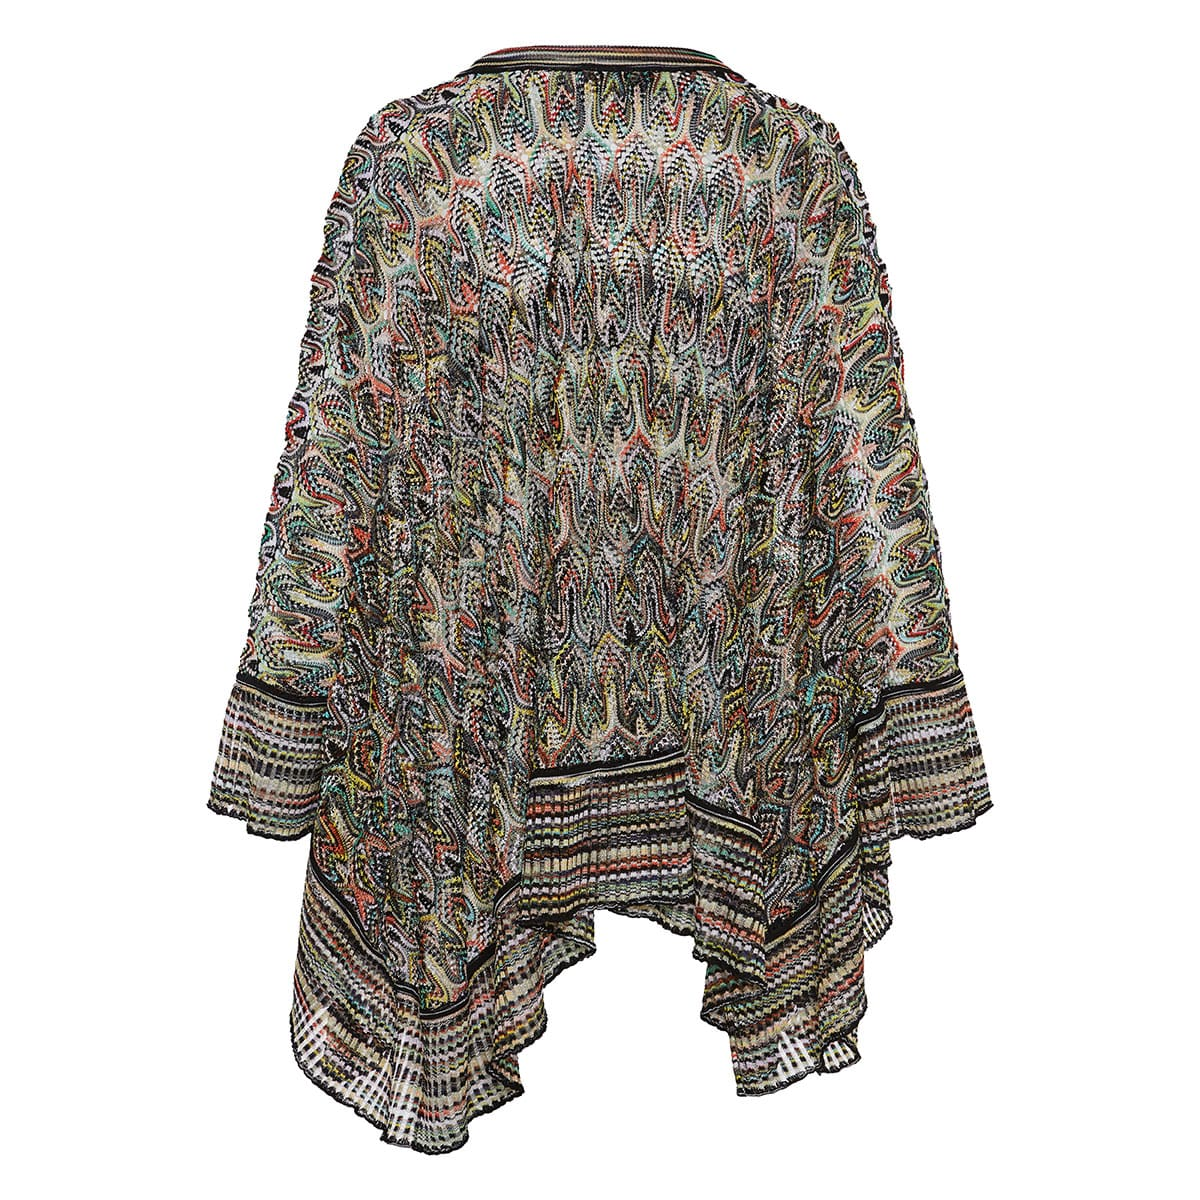 Printed crochet-knitted oversized blouse